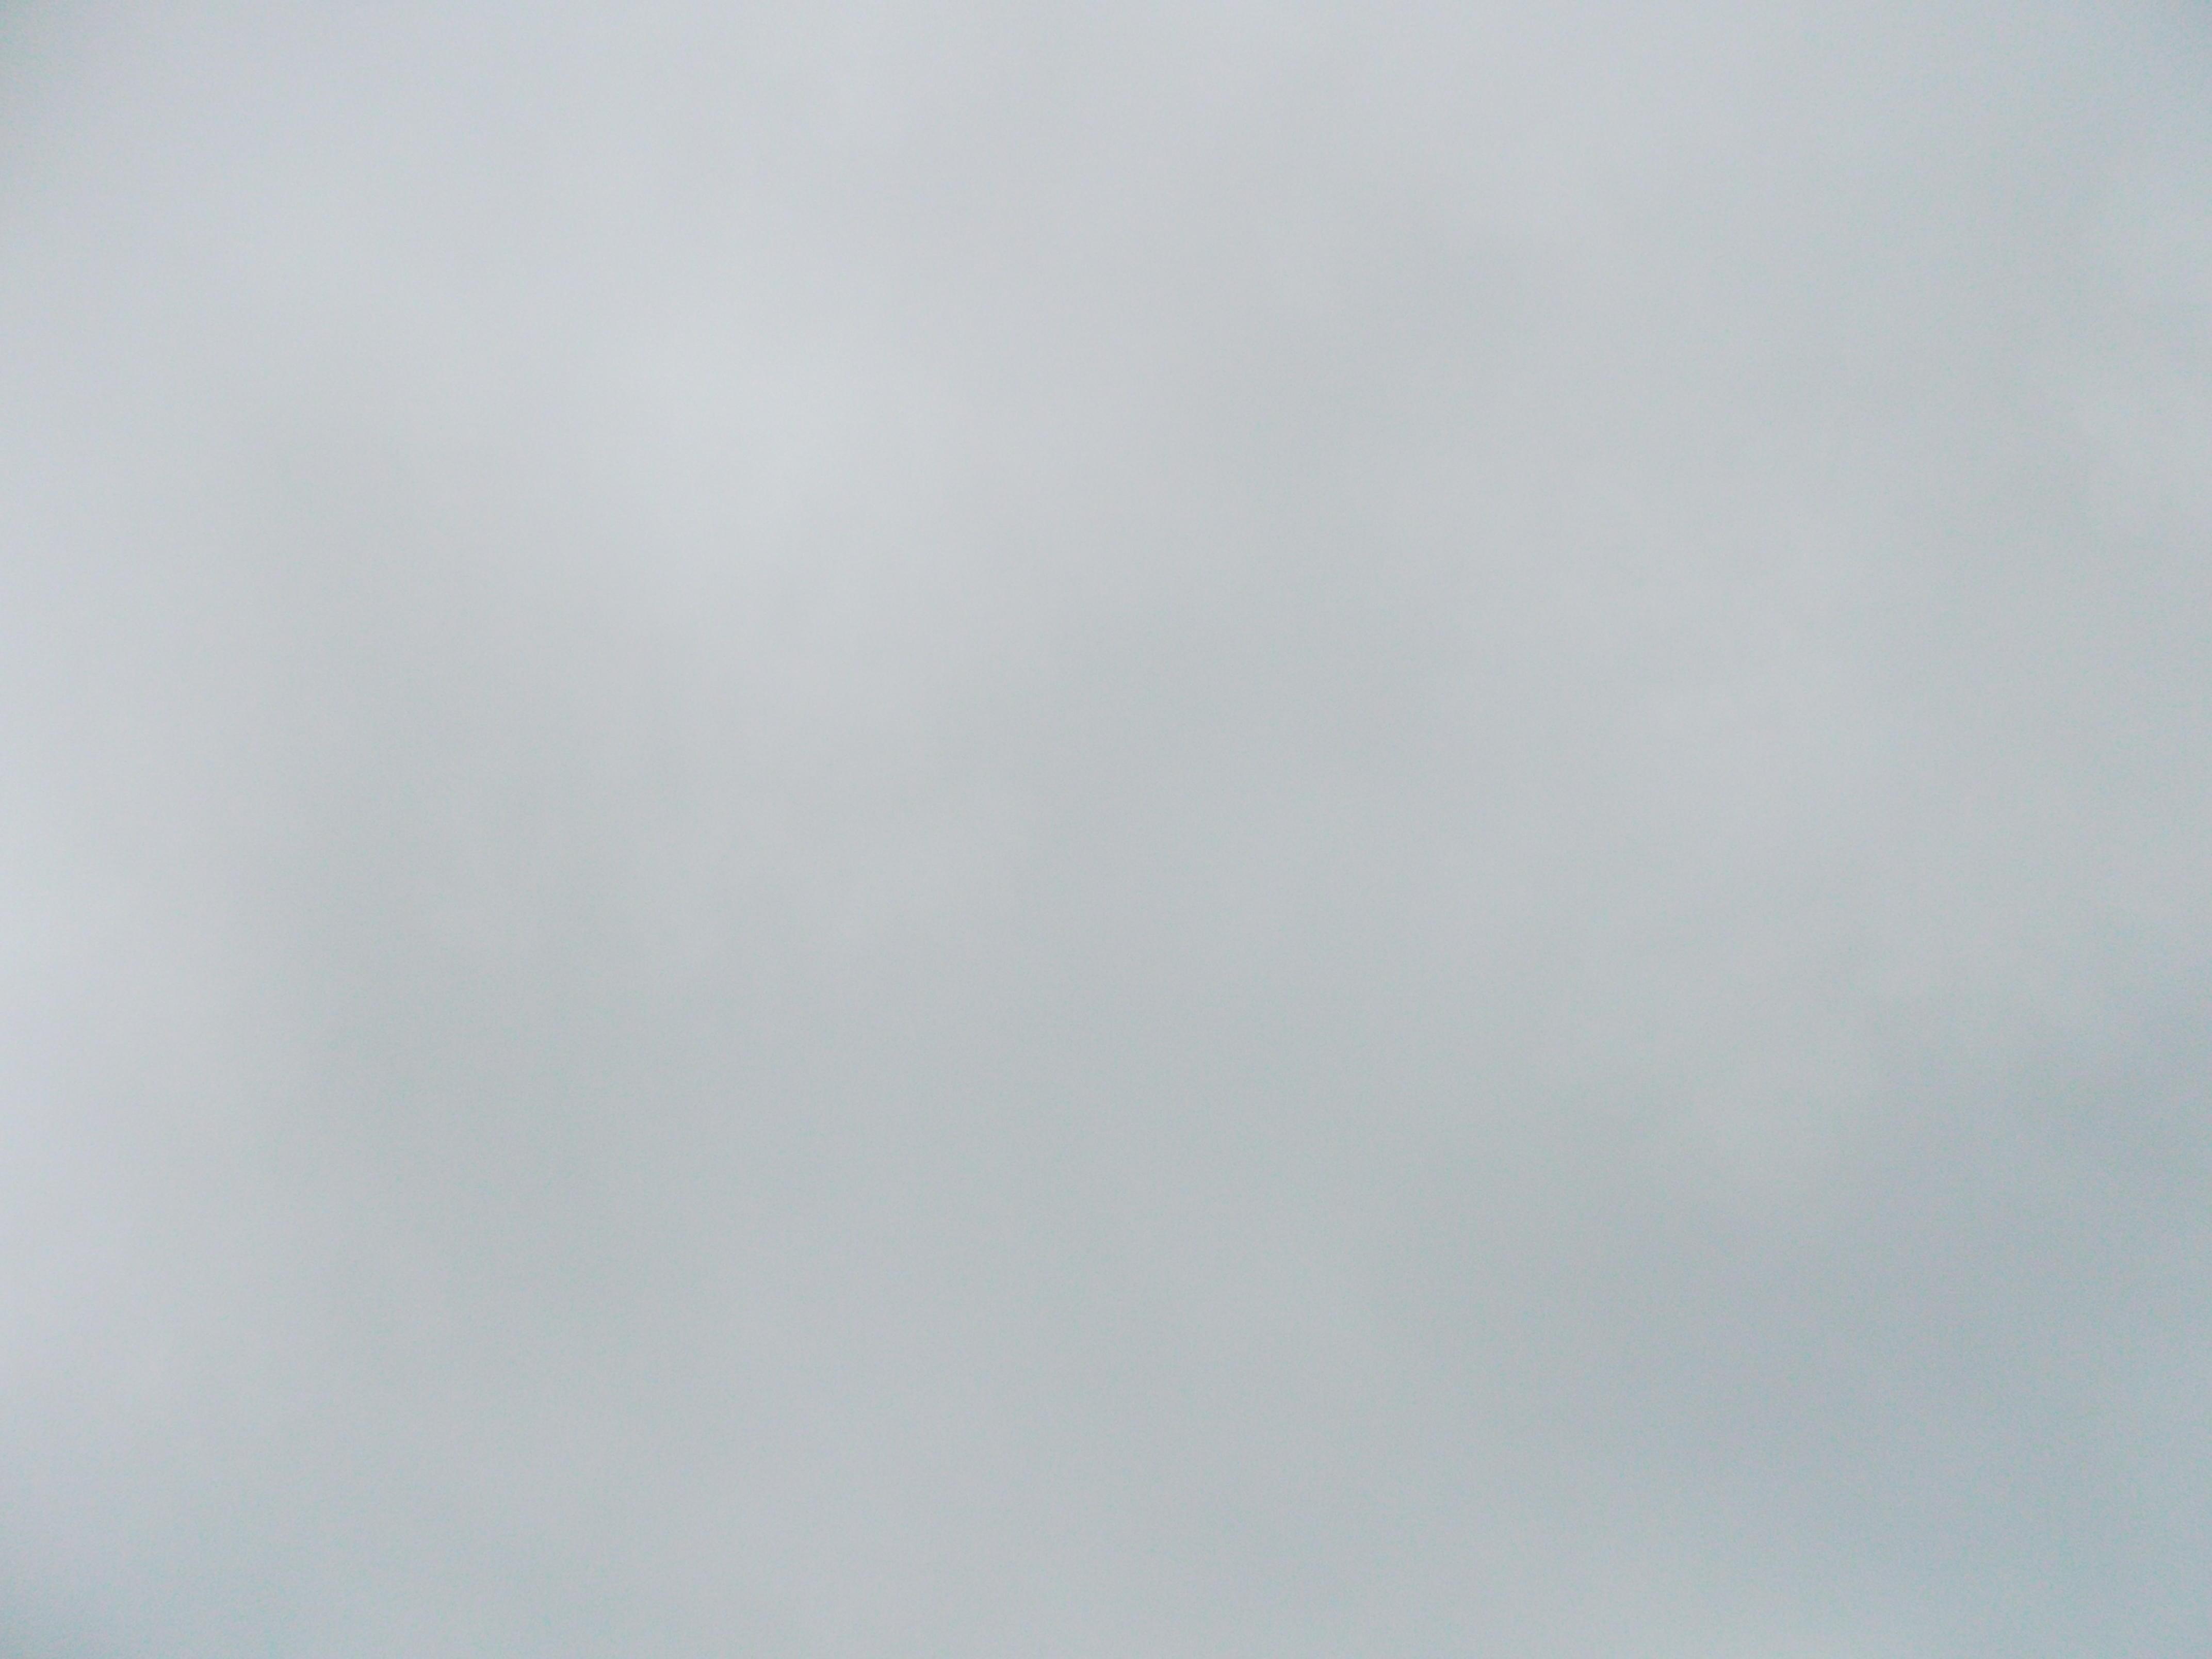 2013-03-06 Longitude -1.08 Latitude 48.85444 Altitude 94 Heure 12h18